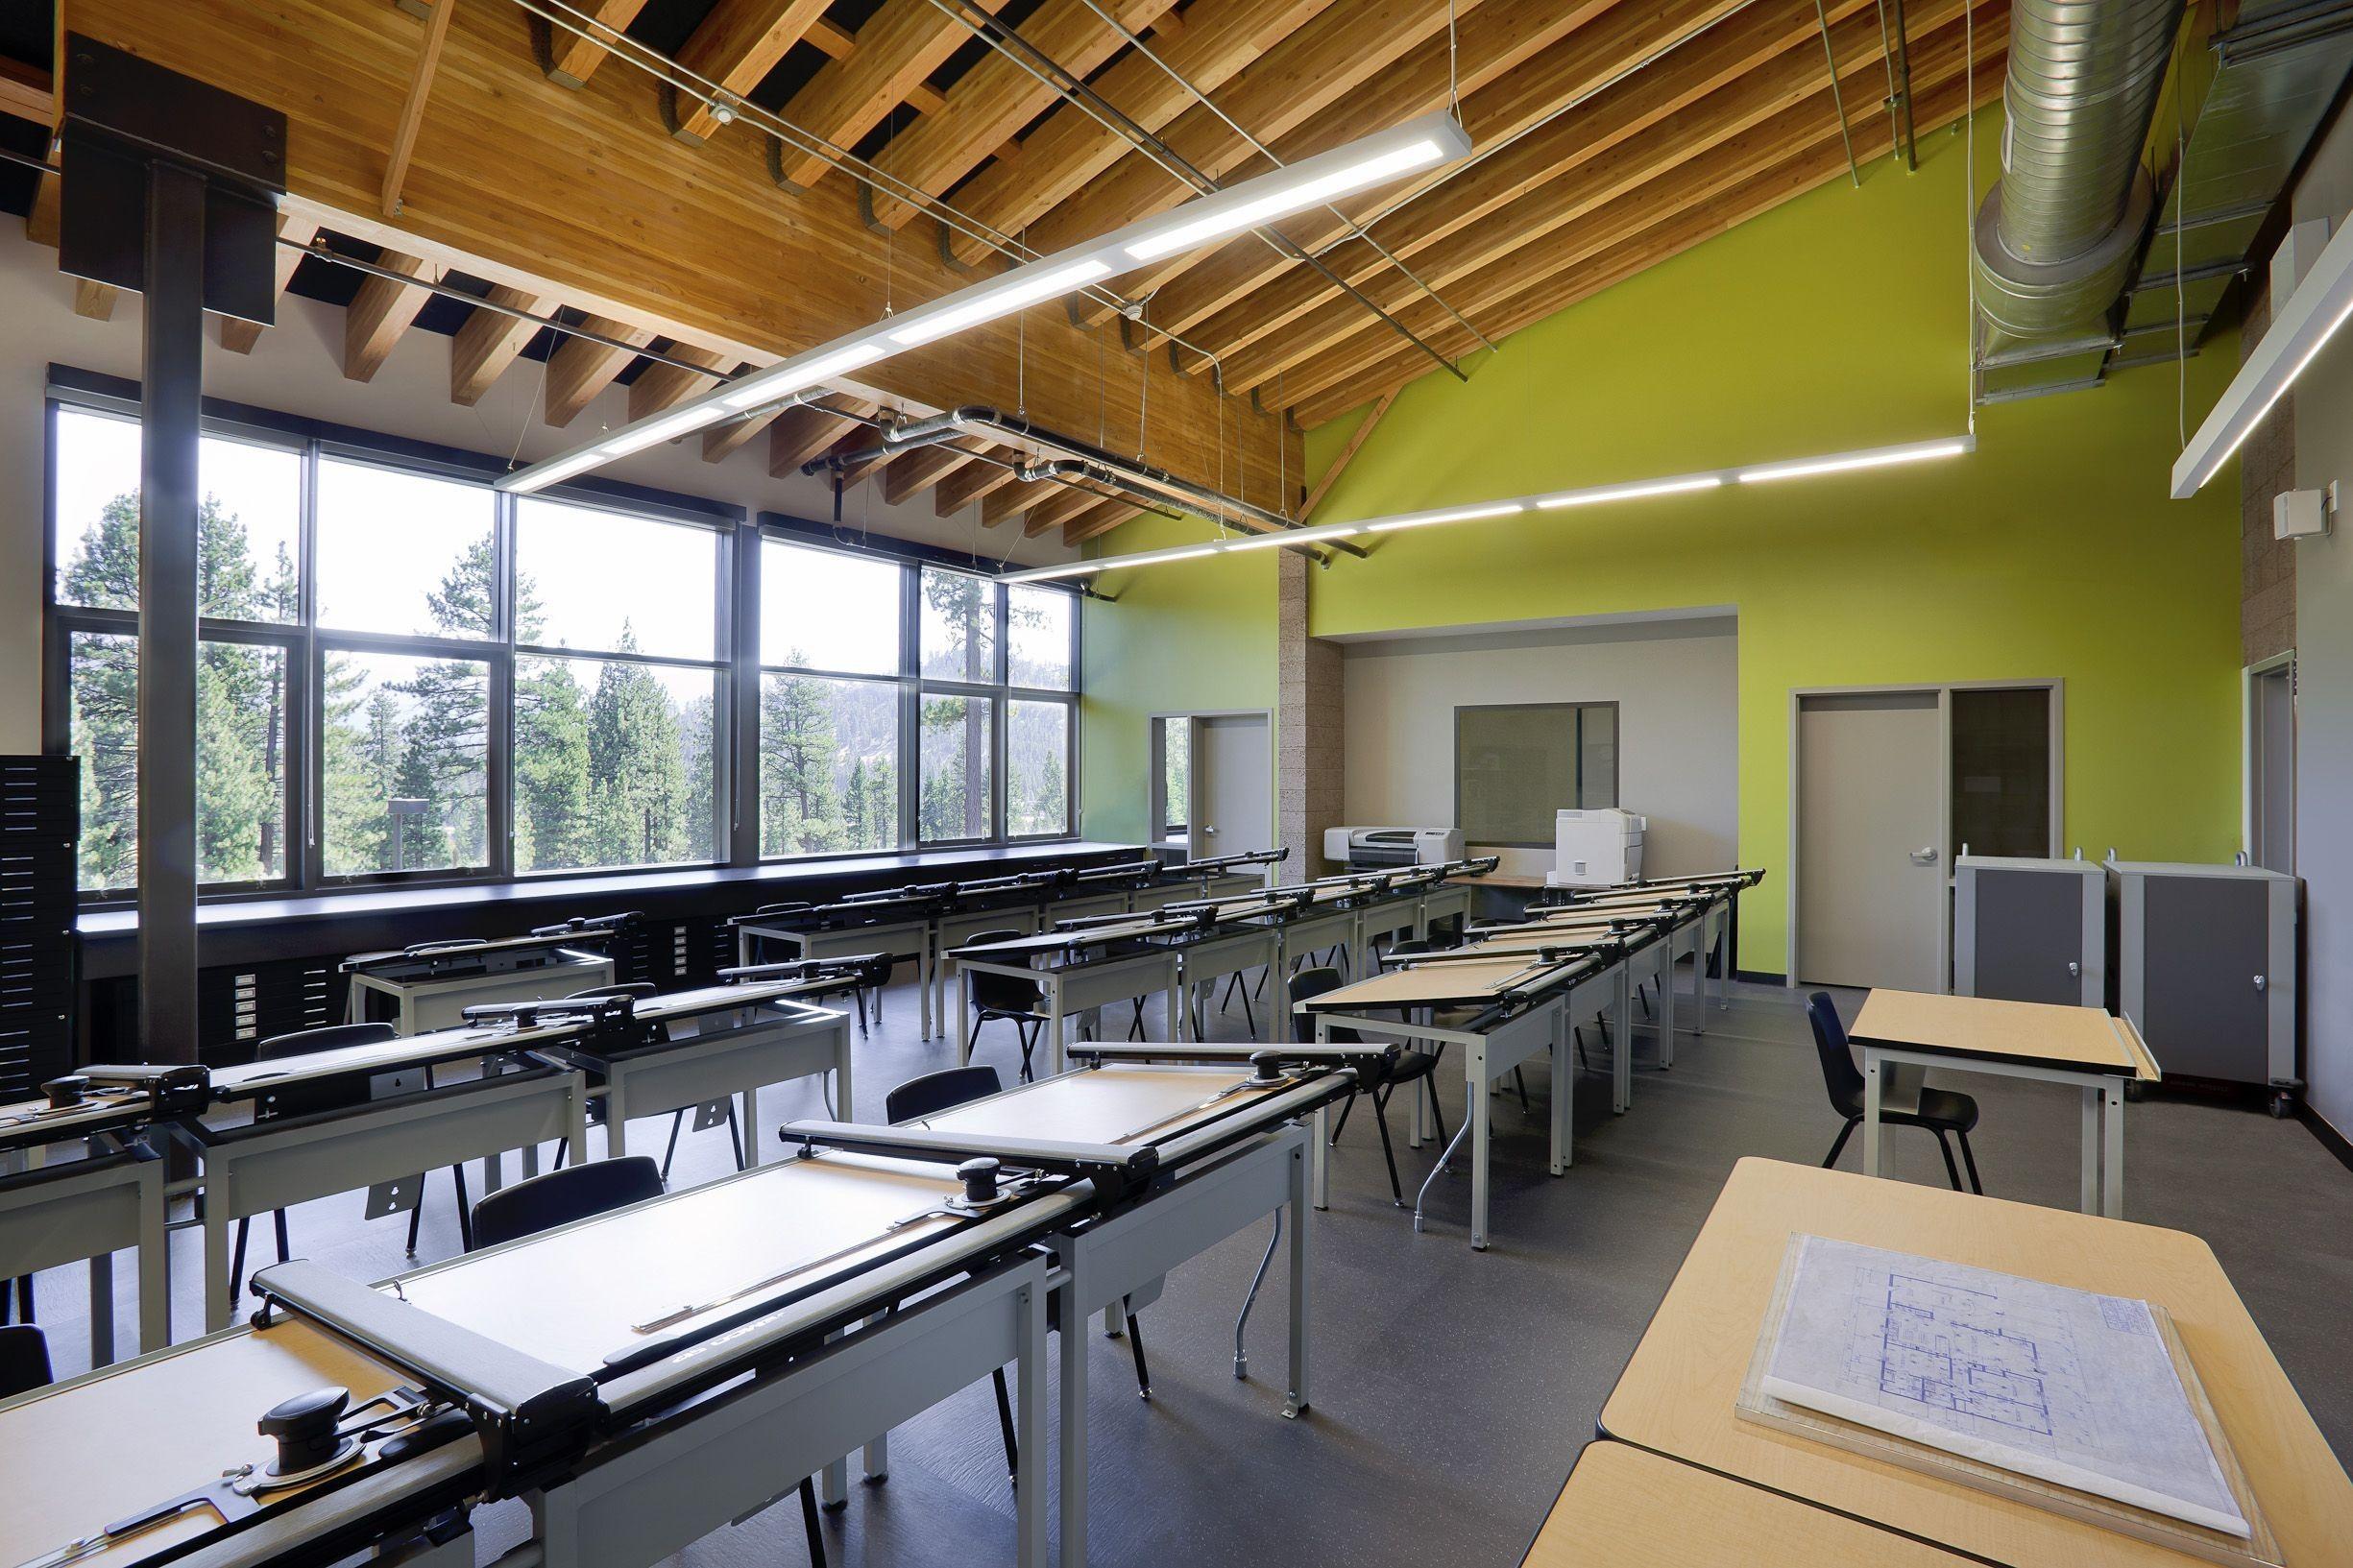 Interior Design Subjects In High School Designing An Aesthetic Interior